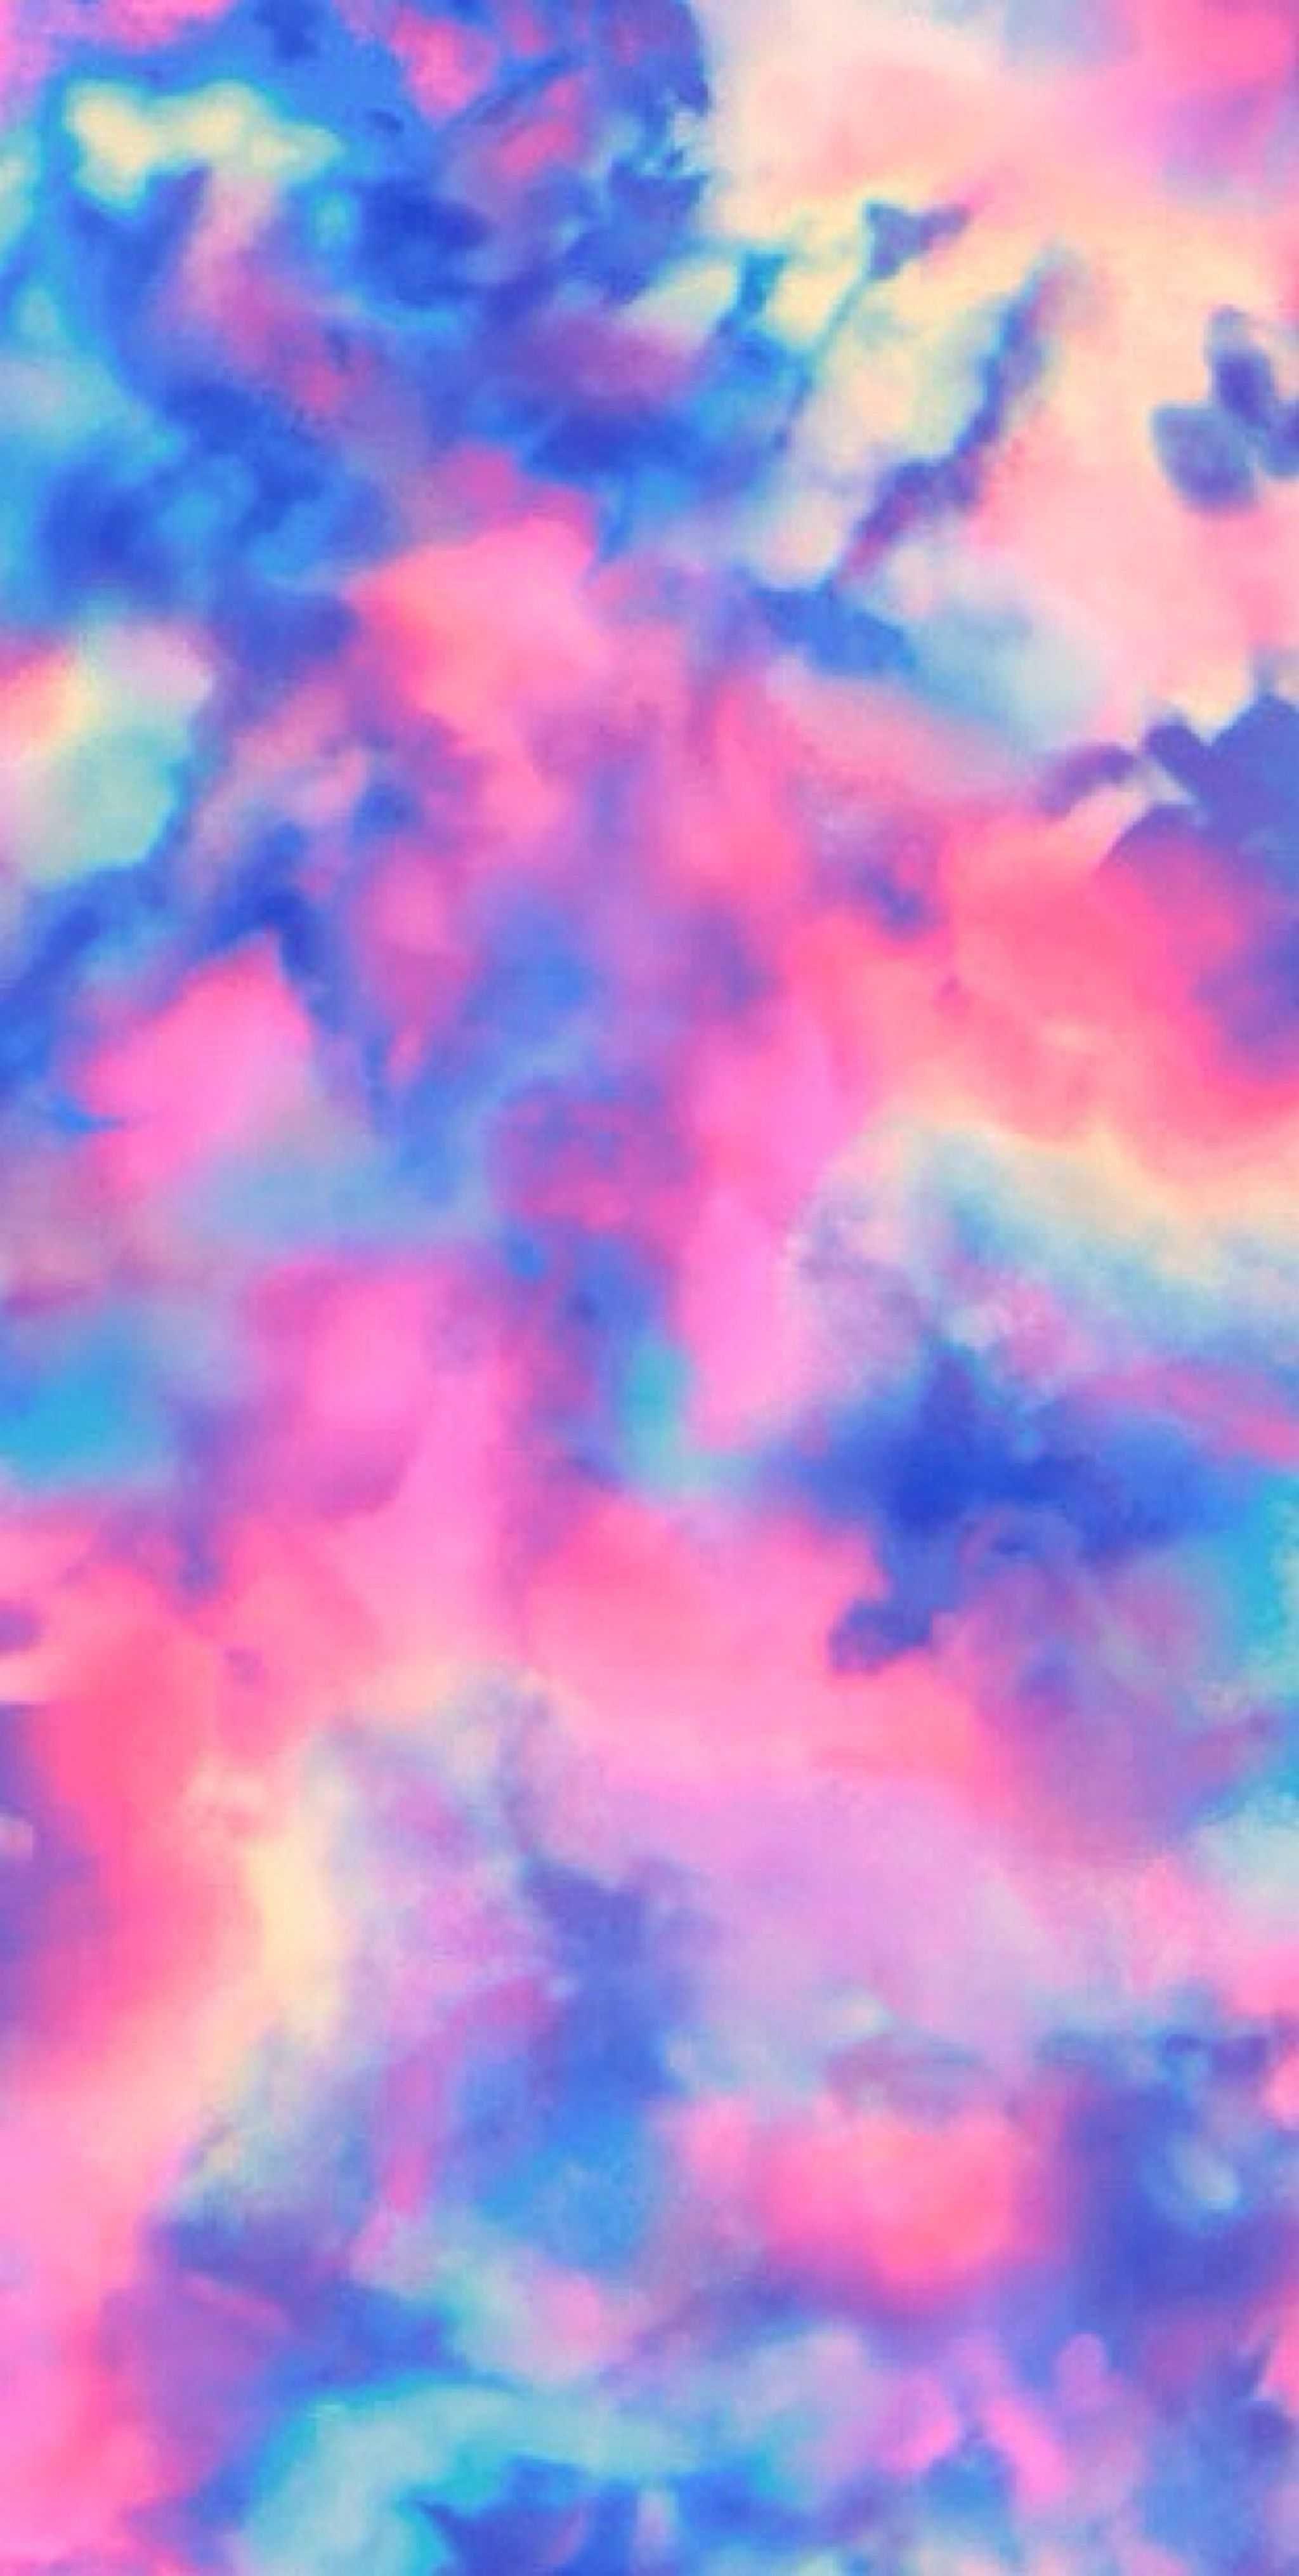 Pastel Marble Laptop Wallpapers Top Free Pastel Marble Laptop Backgrounds Wallpaperaccess Tie Dye Wallpaper Ombre Wallpaper Iphone Ombre Wallpapers